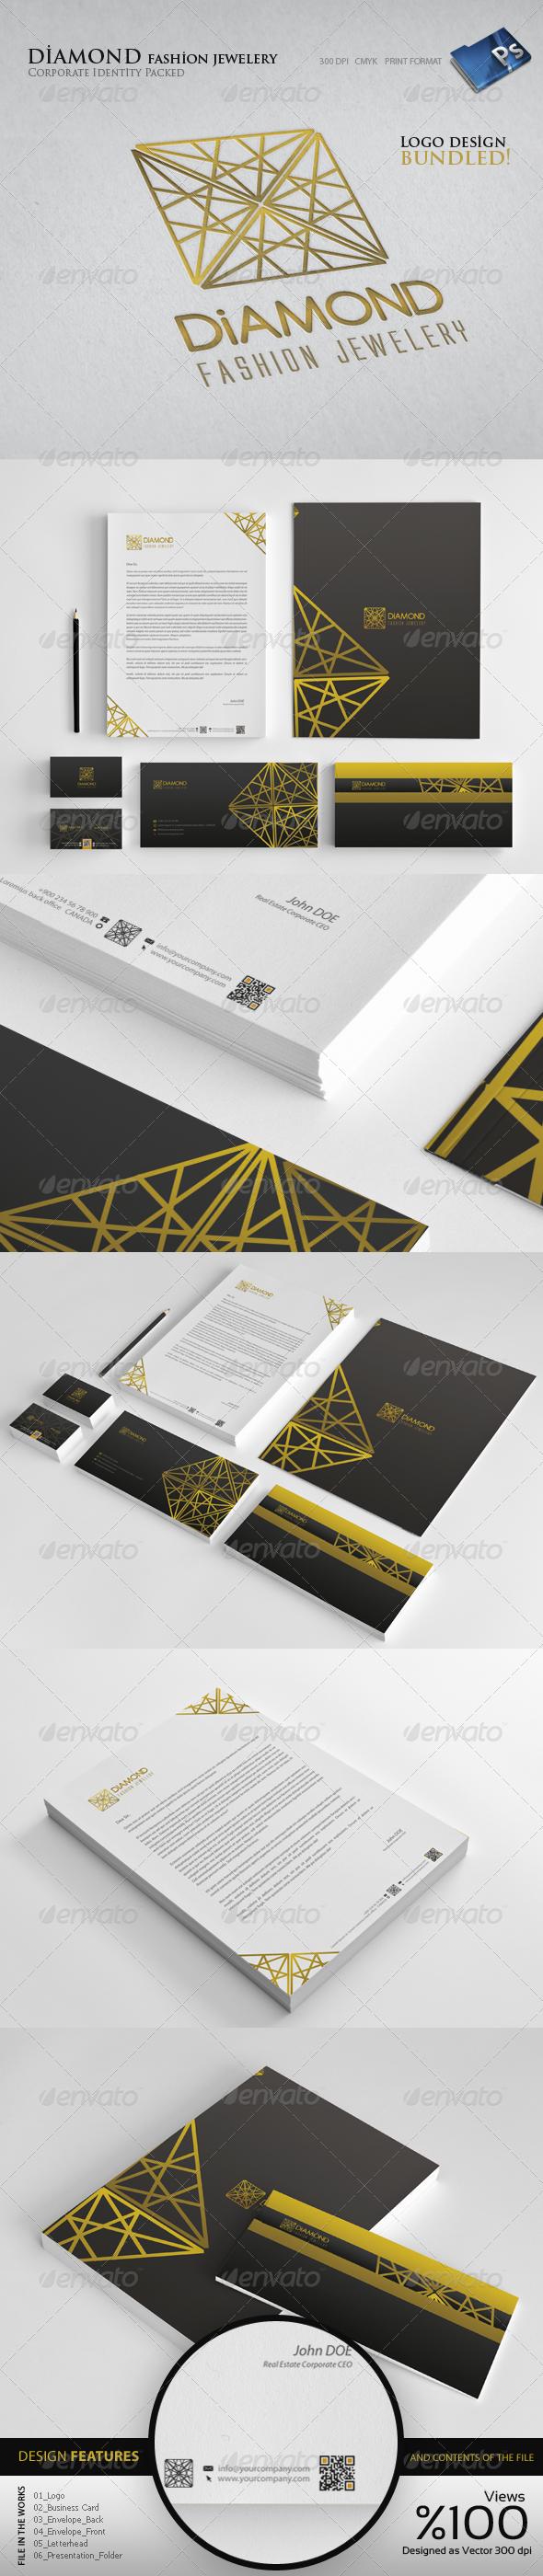 Diamond Jewelery  - Corporate identity - Stationery Print Templates